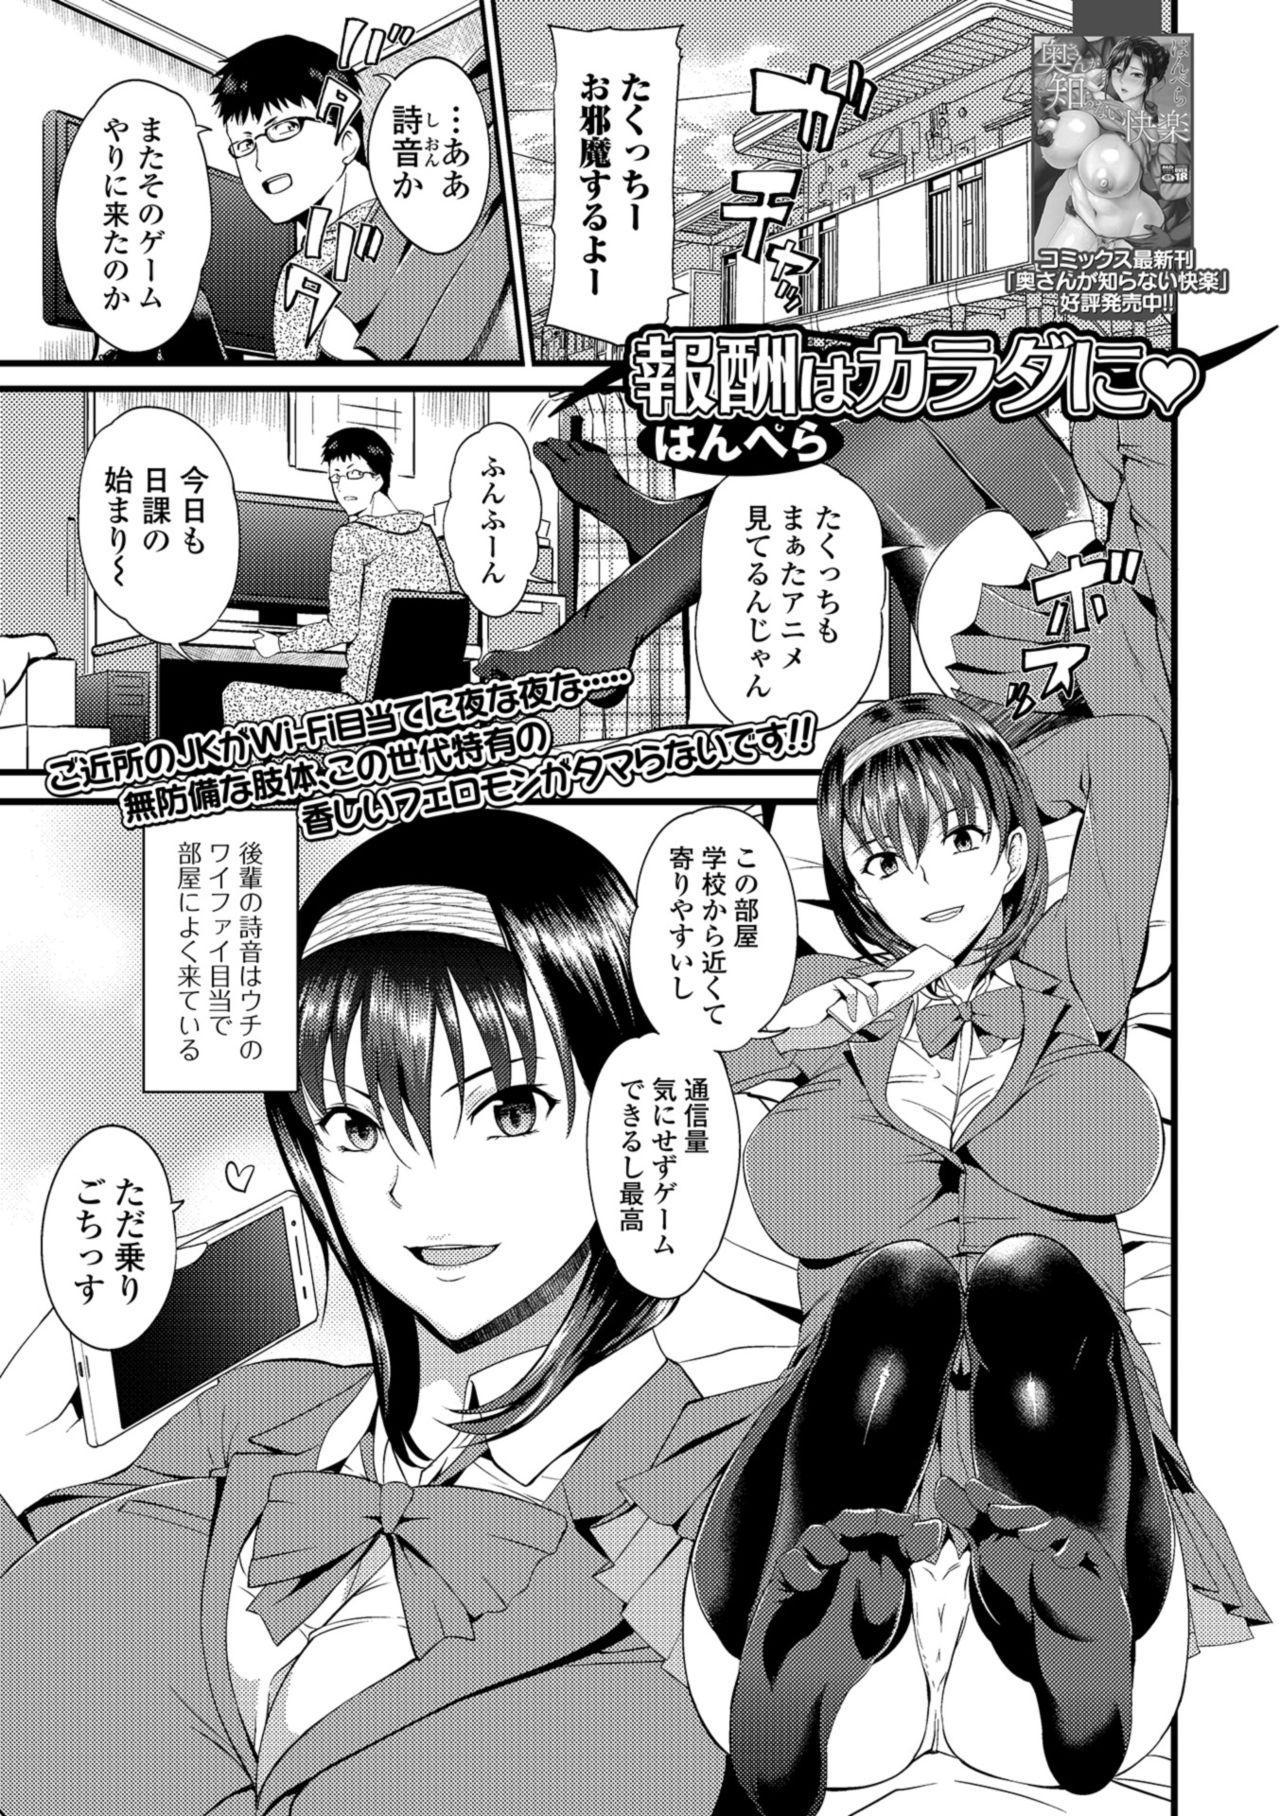 COMIC Shigekiteki SQUIRT!! Vol. 09 198